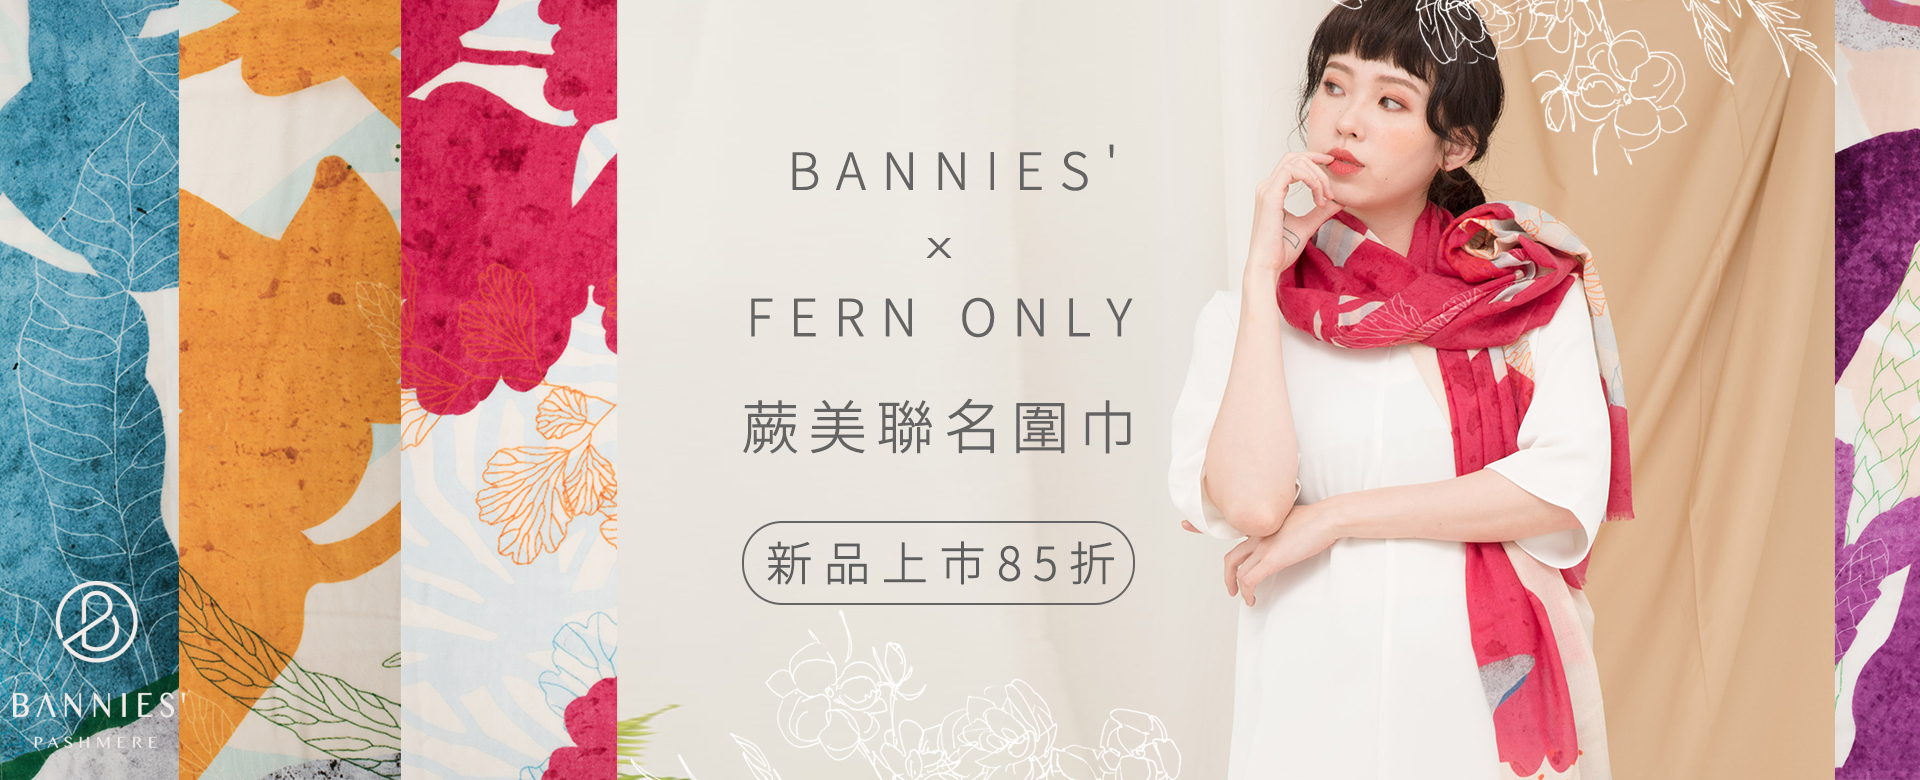 聯名款圍巾-BANNIES X FERN ONLY 蕨美系列